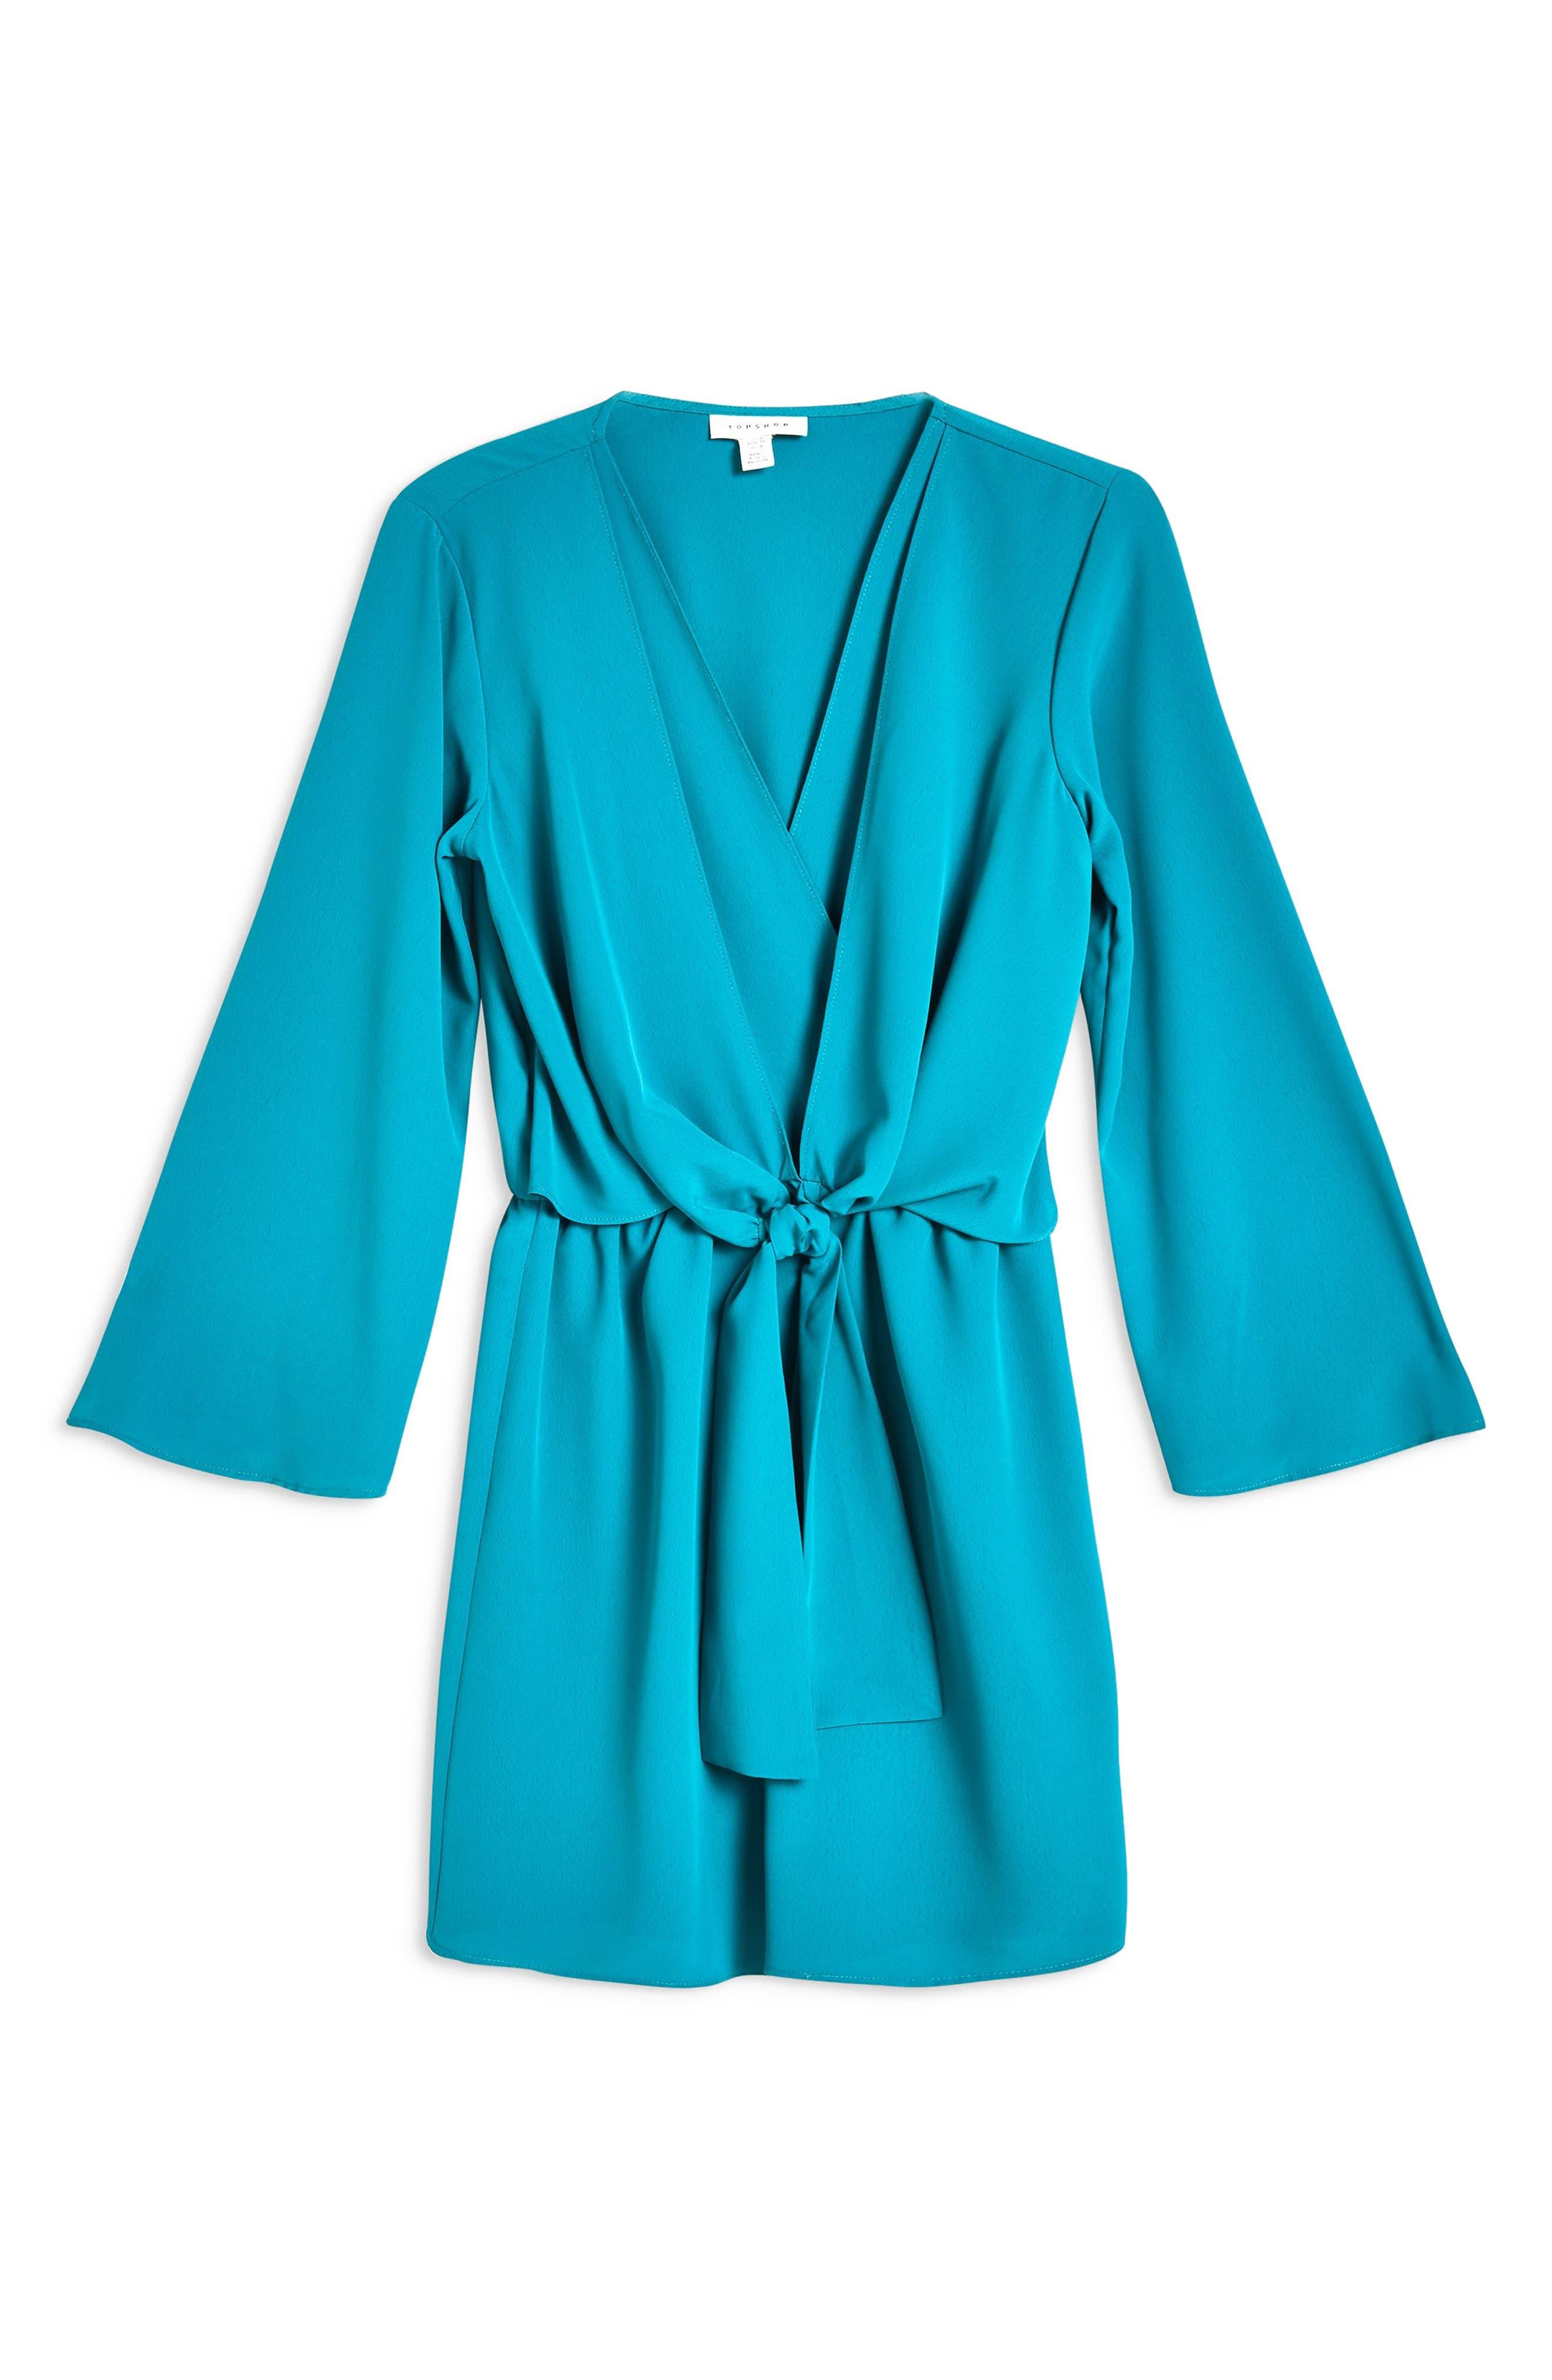 TOPSHOP, Tiffany Knot Minidress, Alternate thumbnail 5, color, TEAL